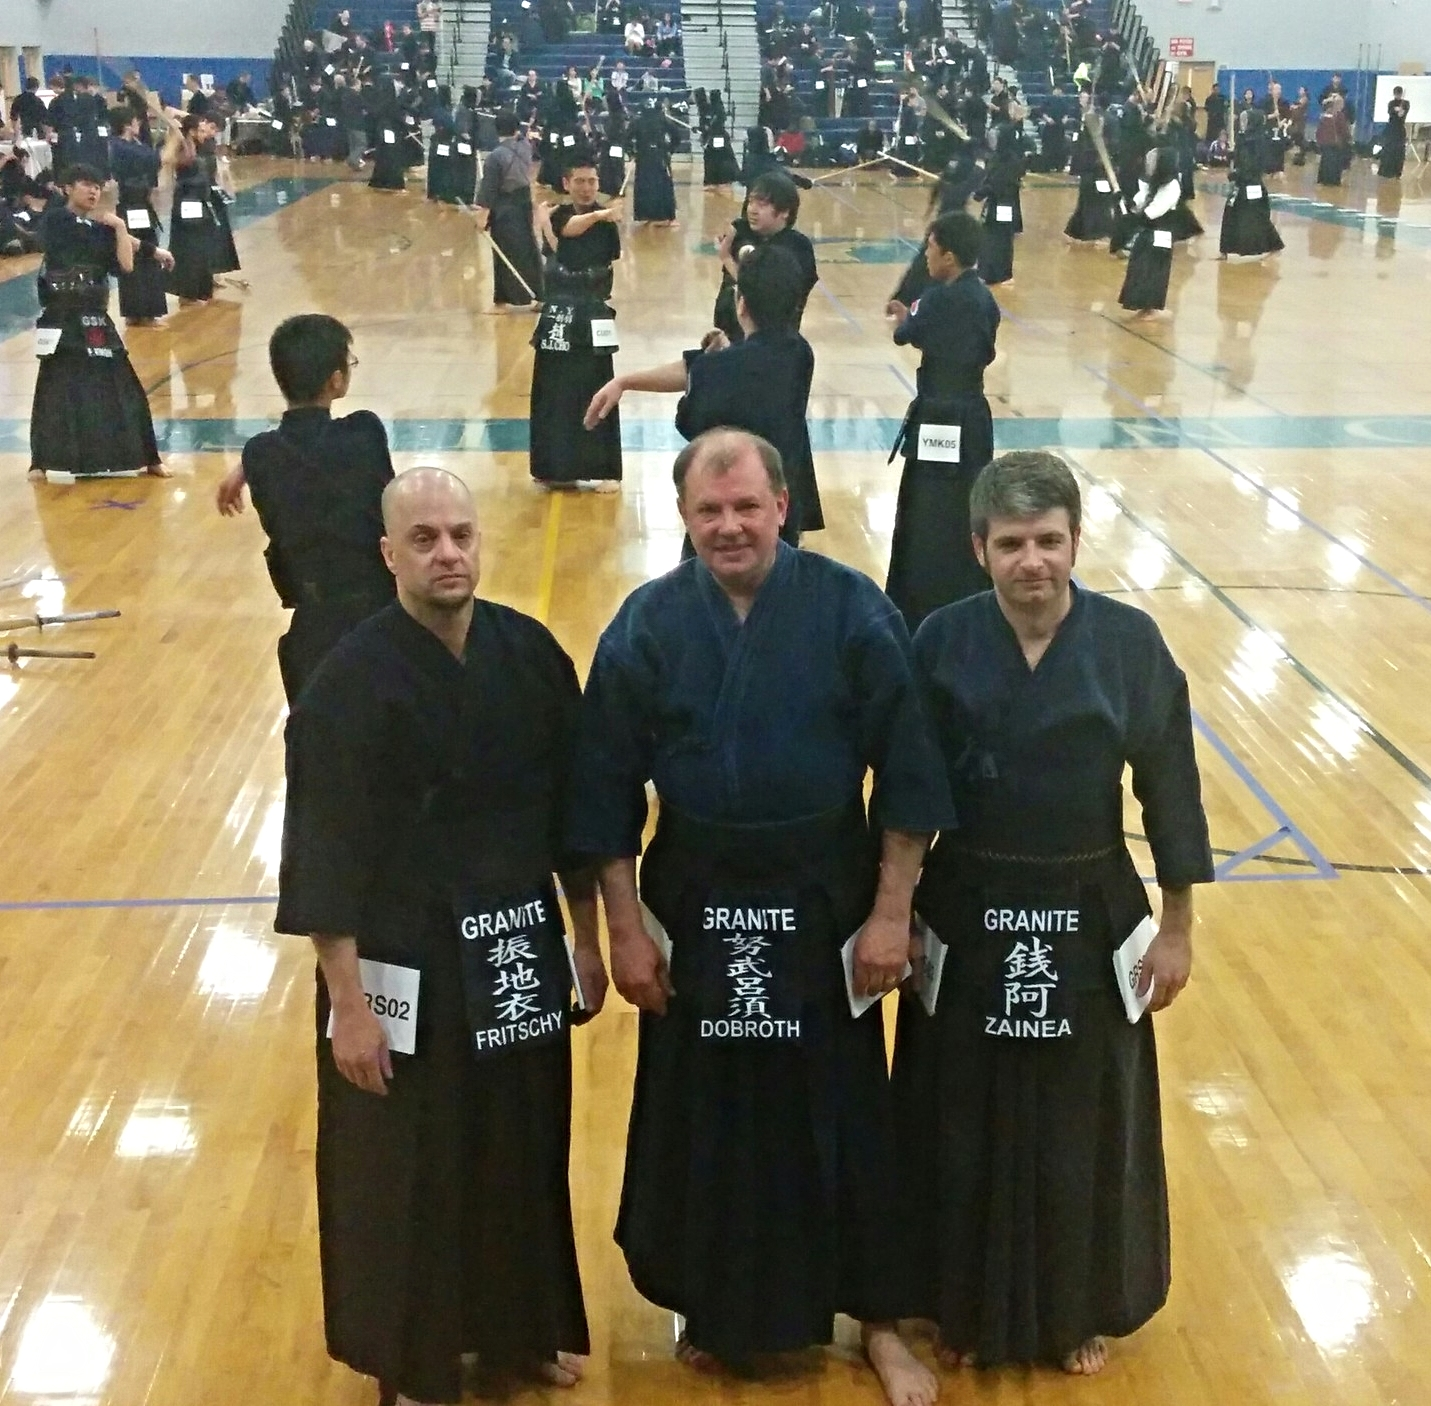 Garden State Kendo Tournament, Union City NJ, April 18th 2015